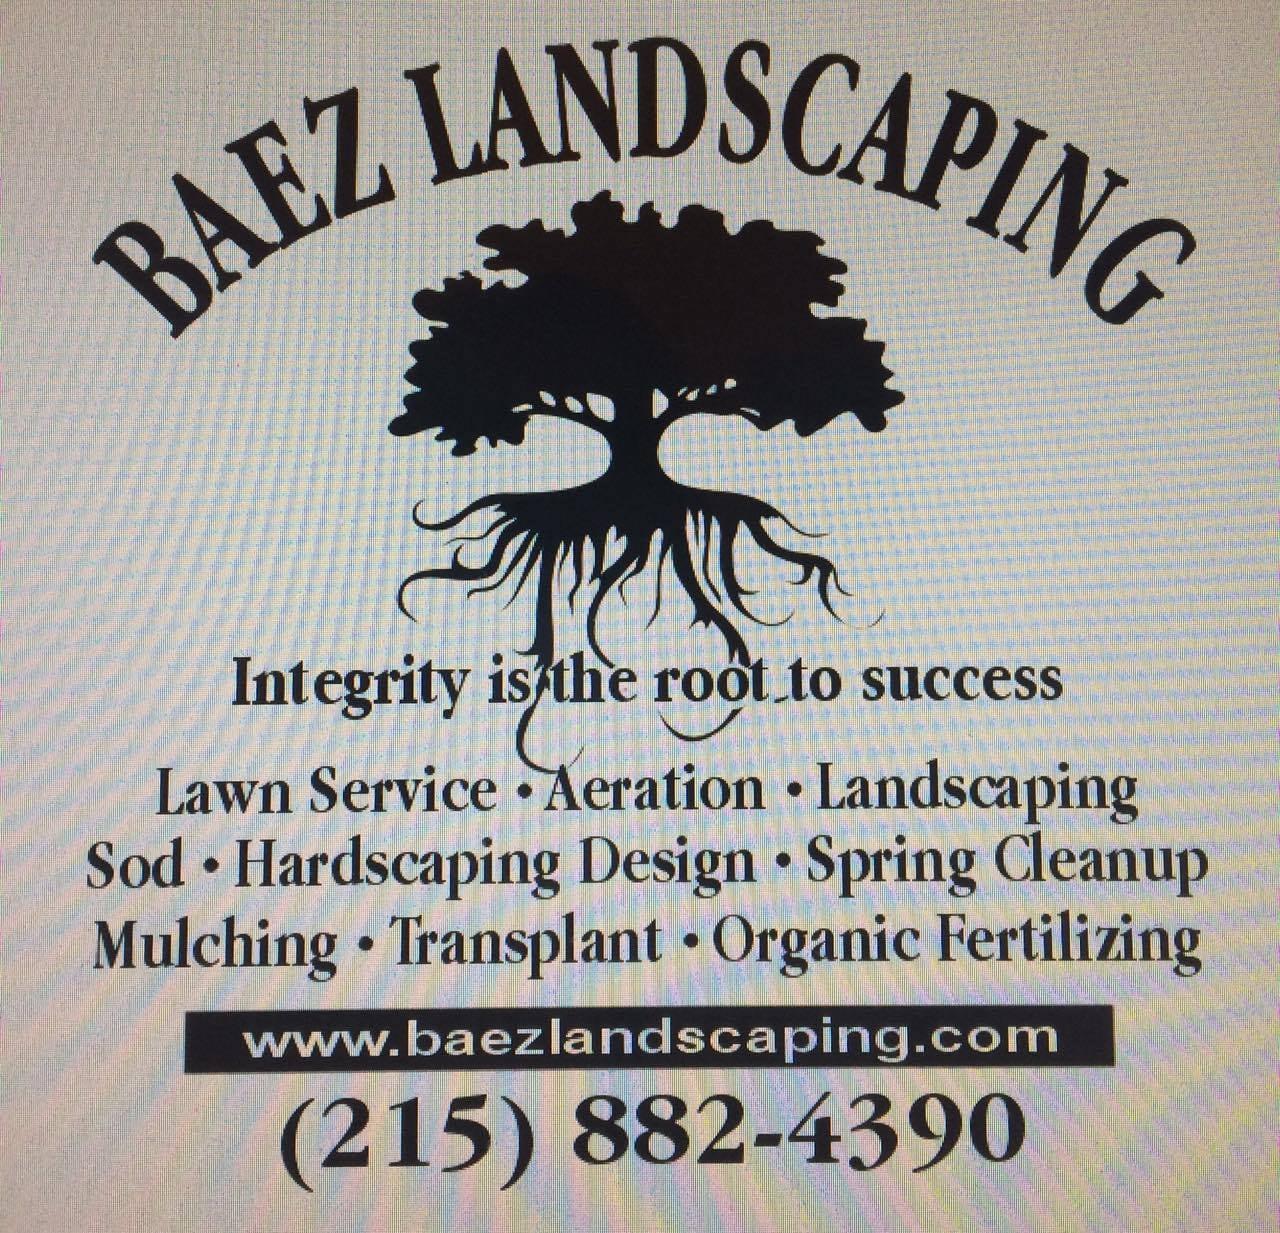 Baez Landscaping